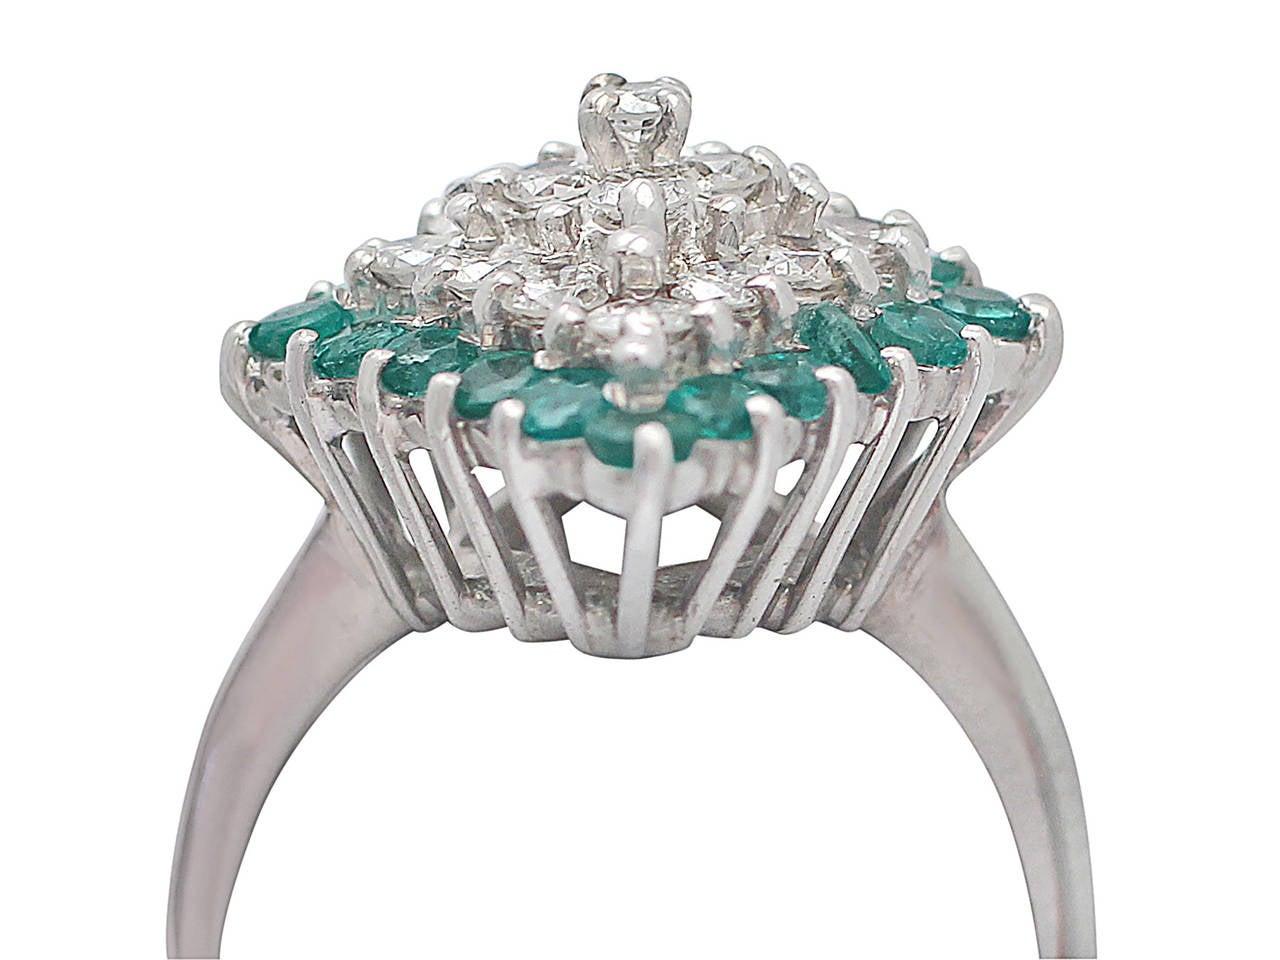 1975 Emerald & 1.36 Carat Diamond White Gold Cocktail Ring 2